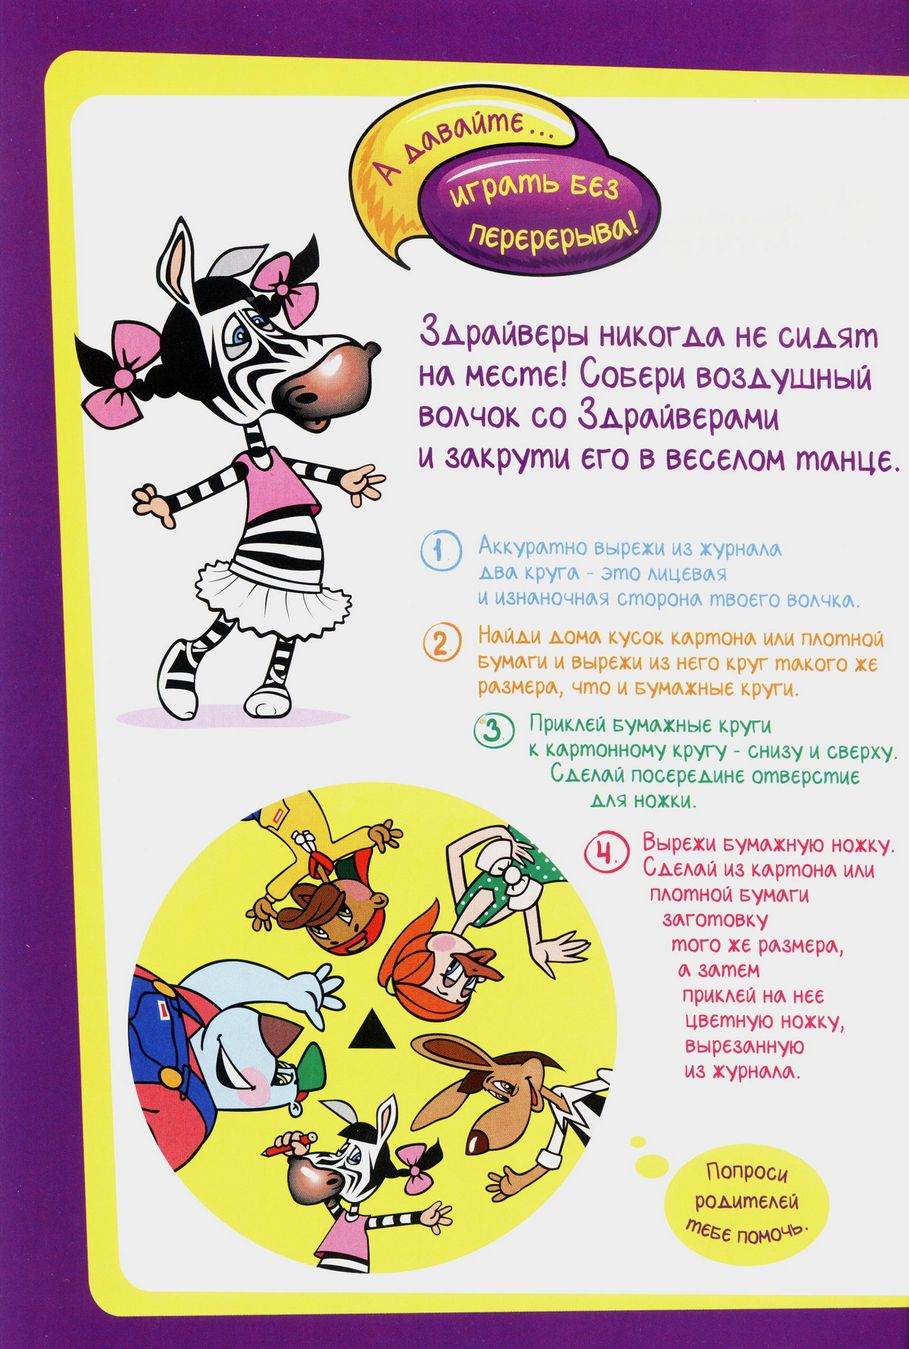 Комикс Винкс Winx - Неверное решение (Журнал Винкс №3 2011) - стр. 10